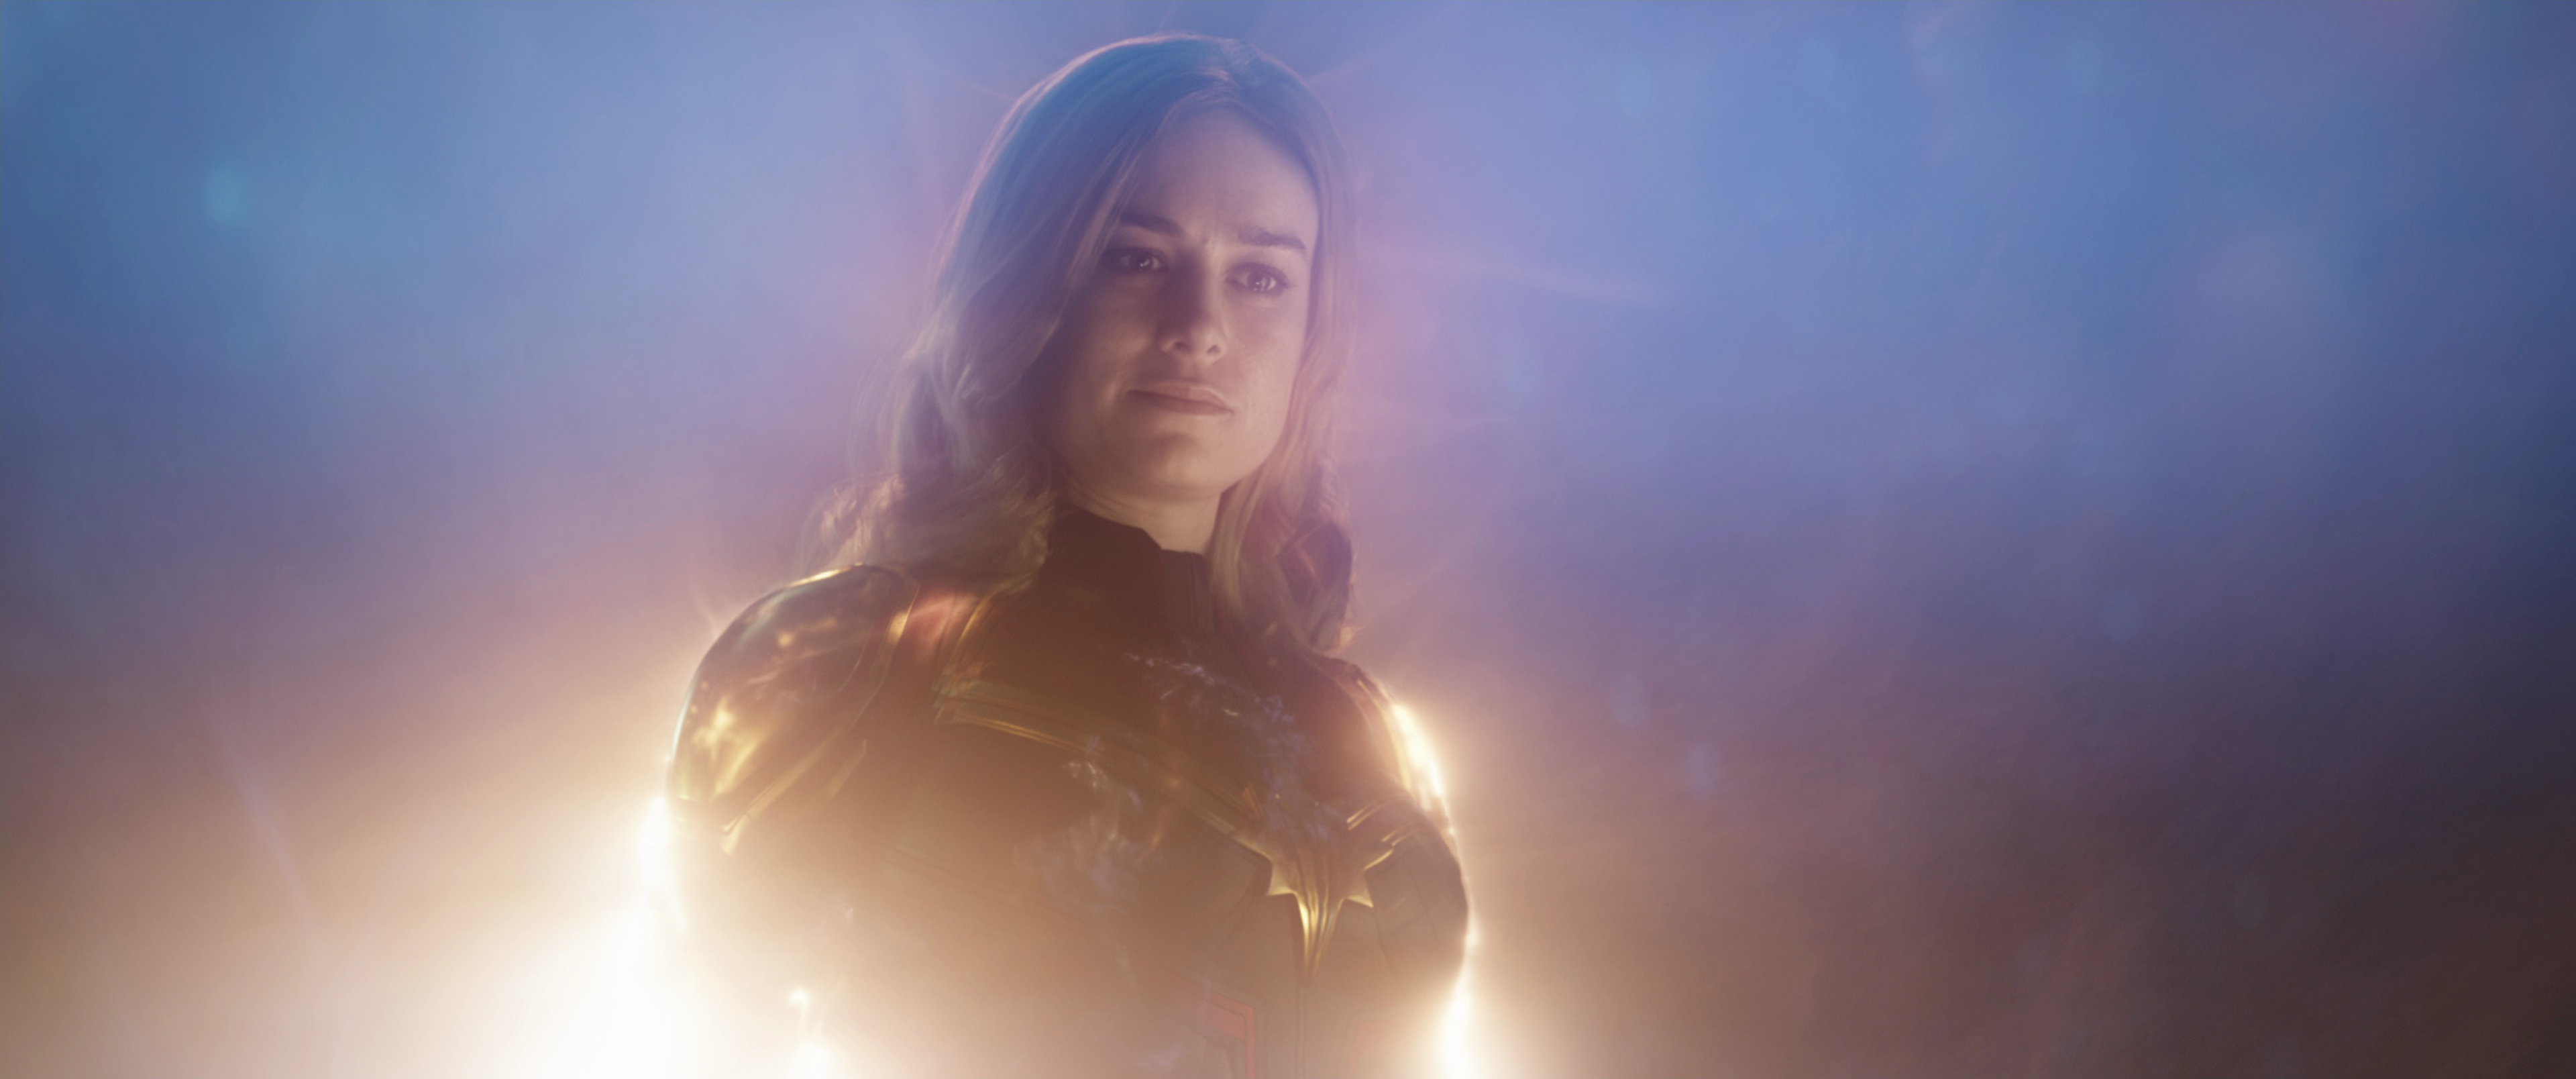 Coolrod85/PG Proposal: Captain Marvel (MCU)